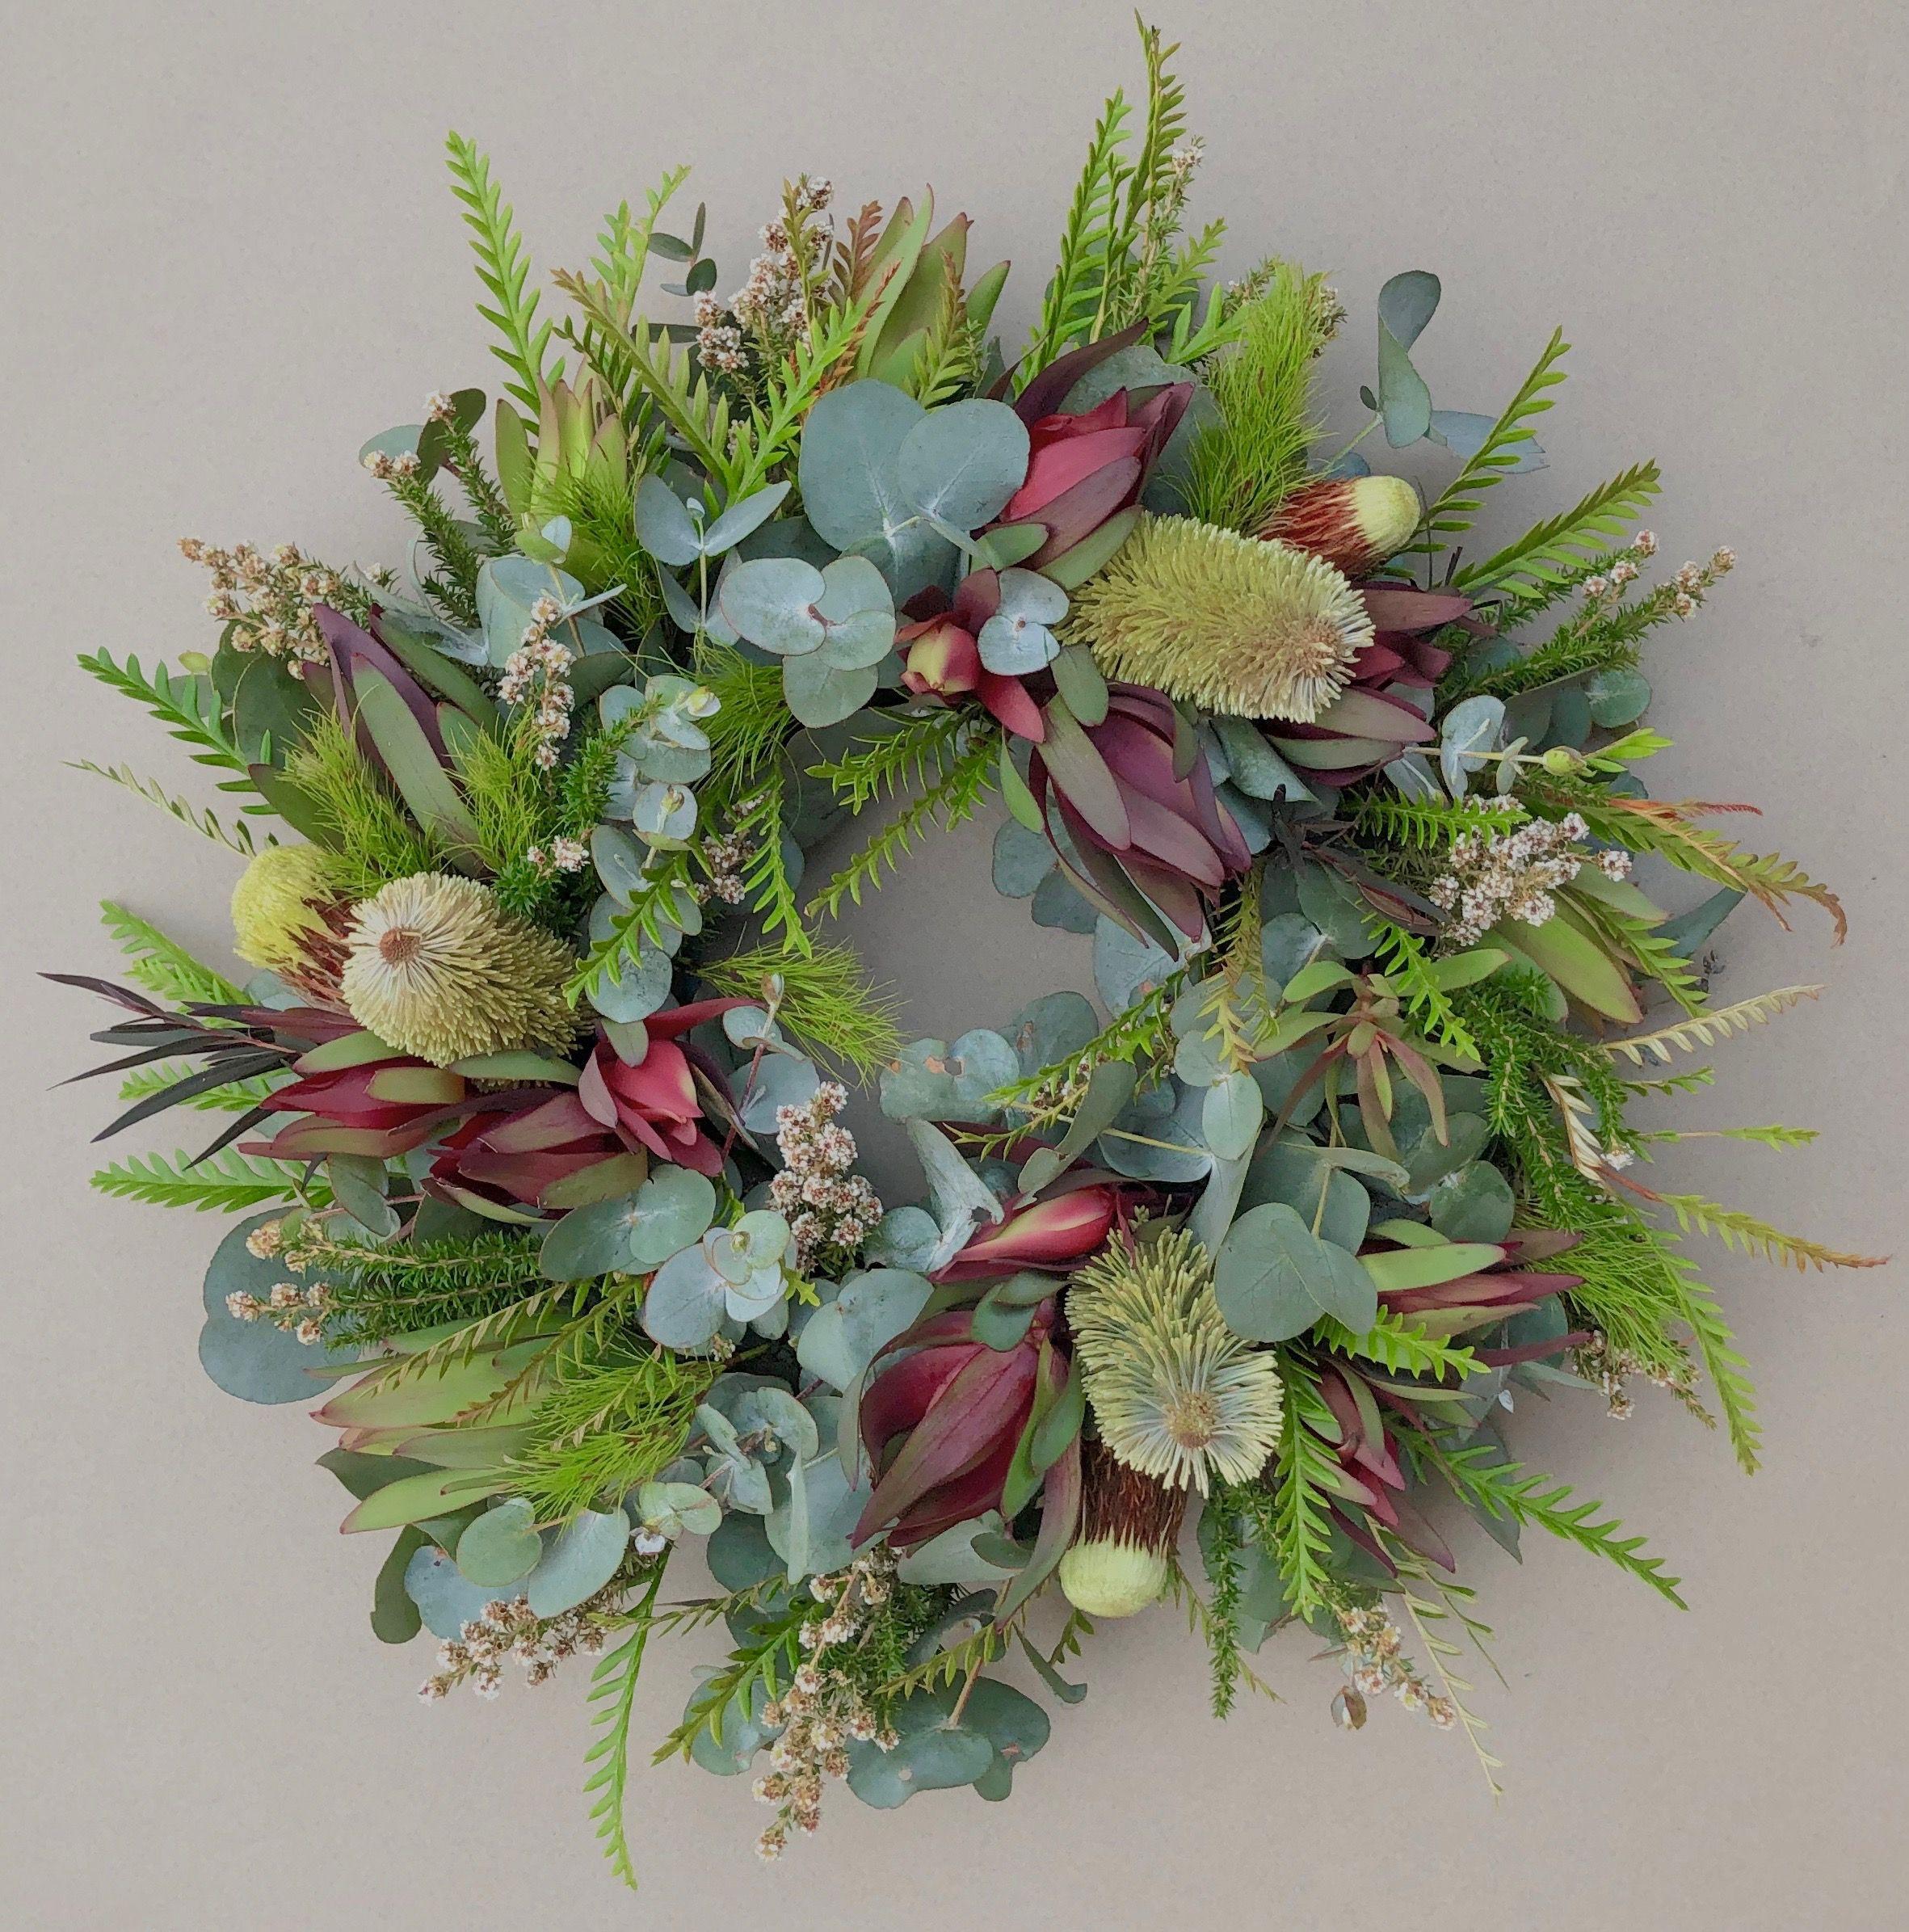 Anzac Wreath by Native Bunch. All Australian foliage with